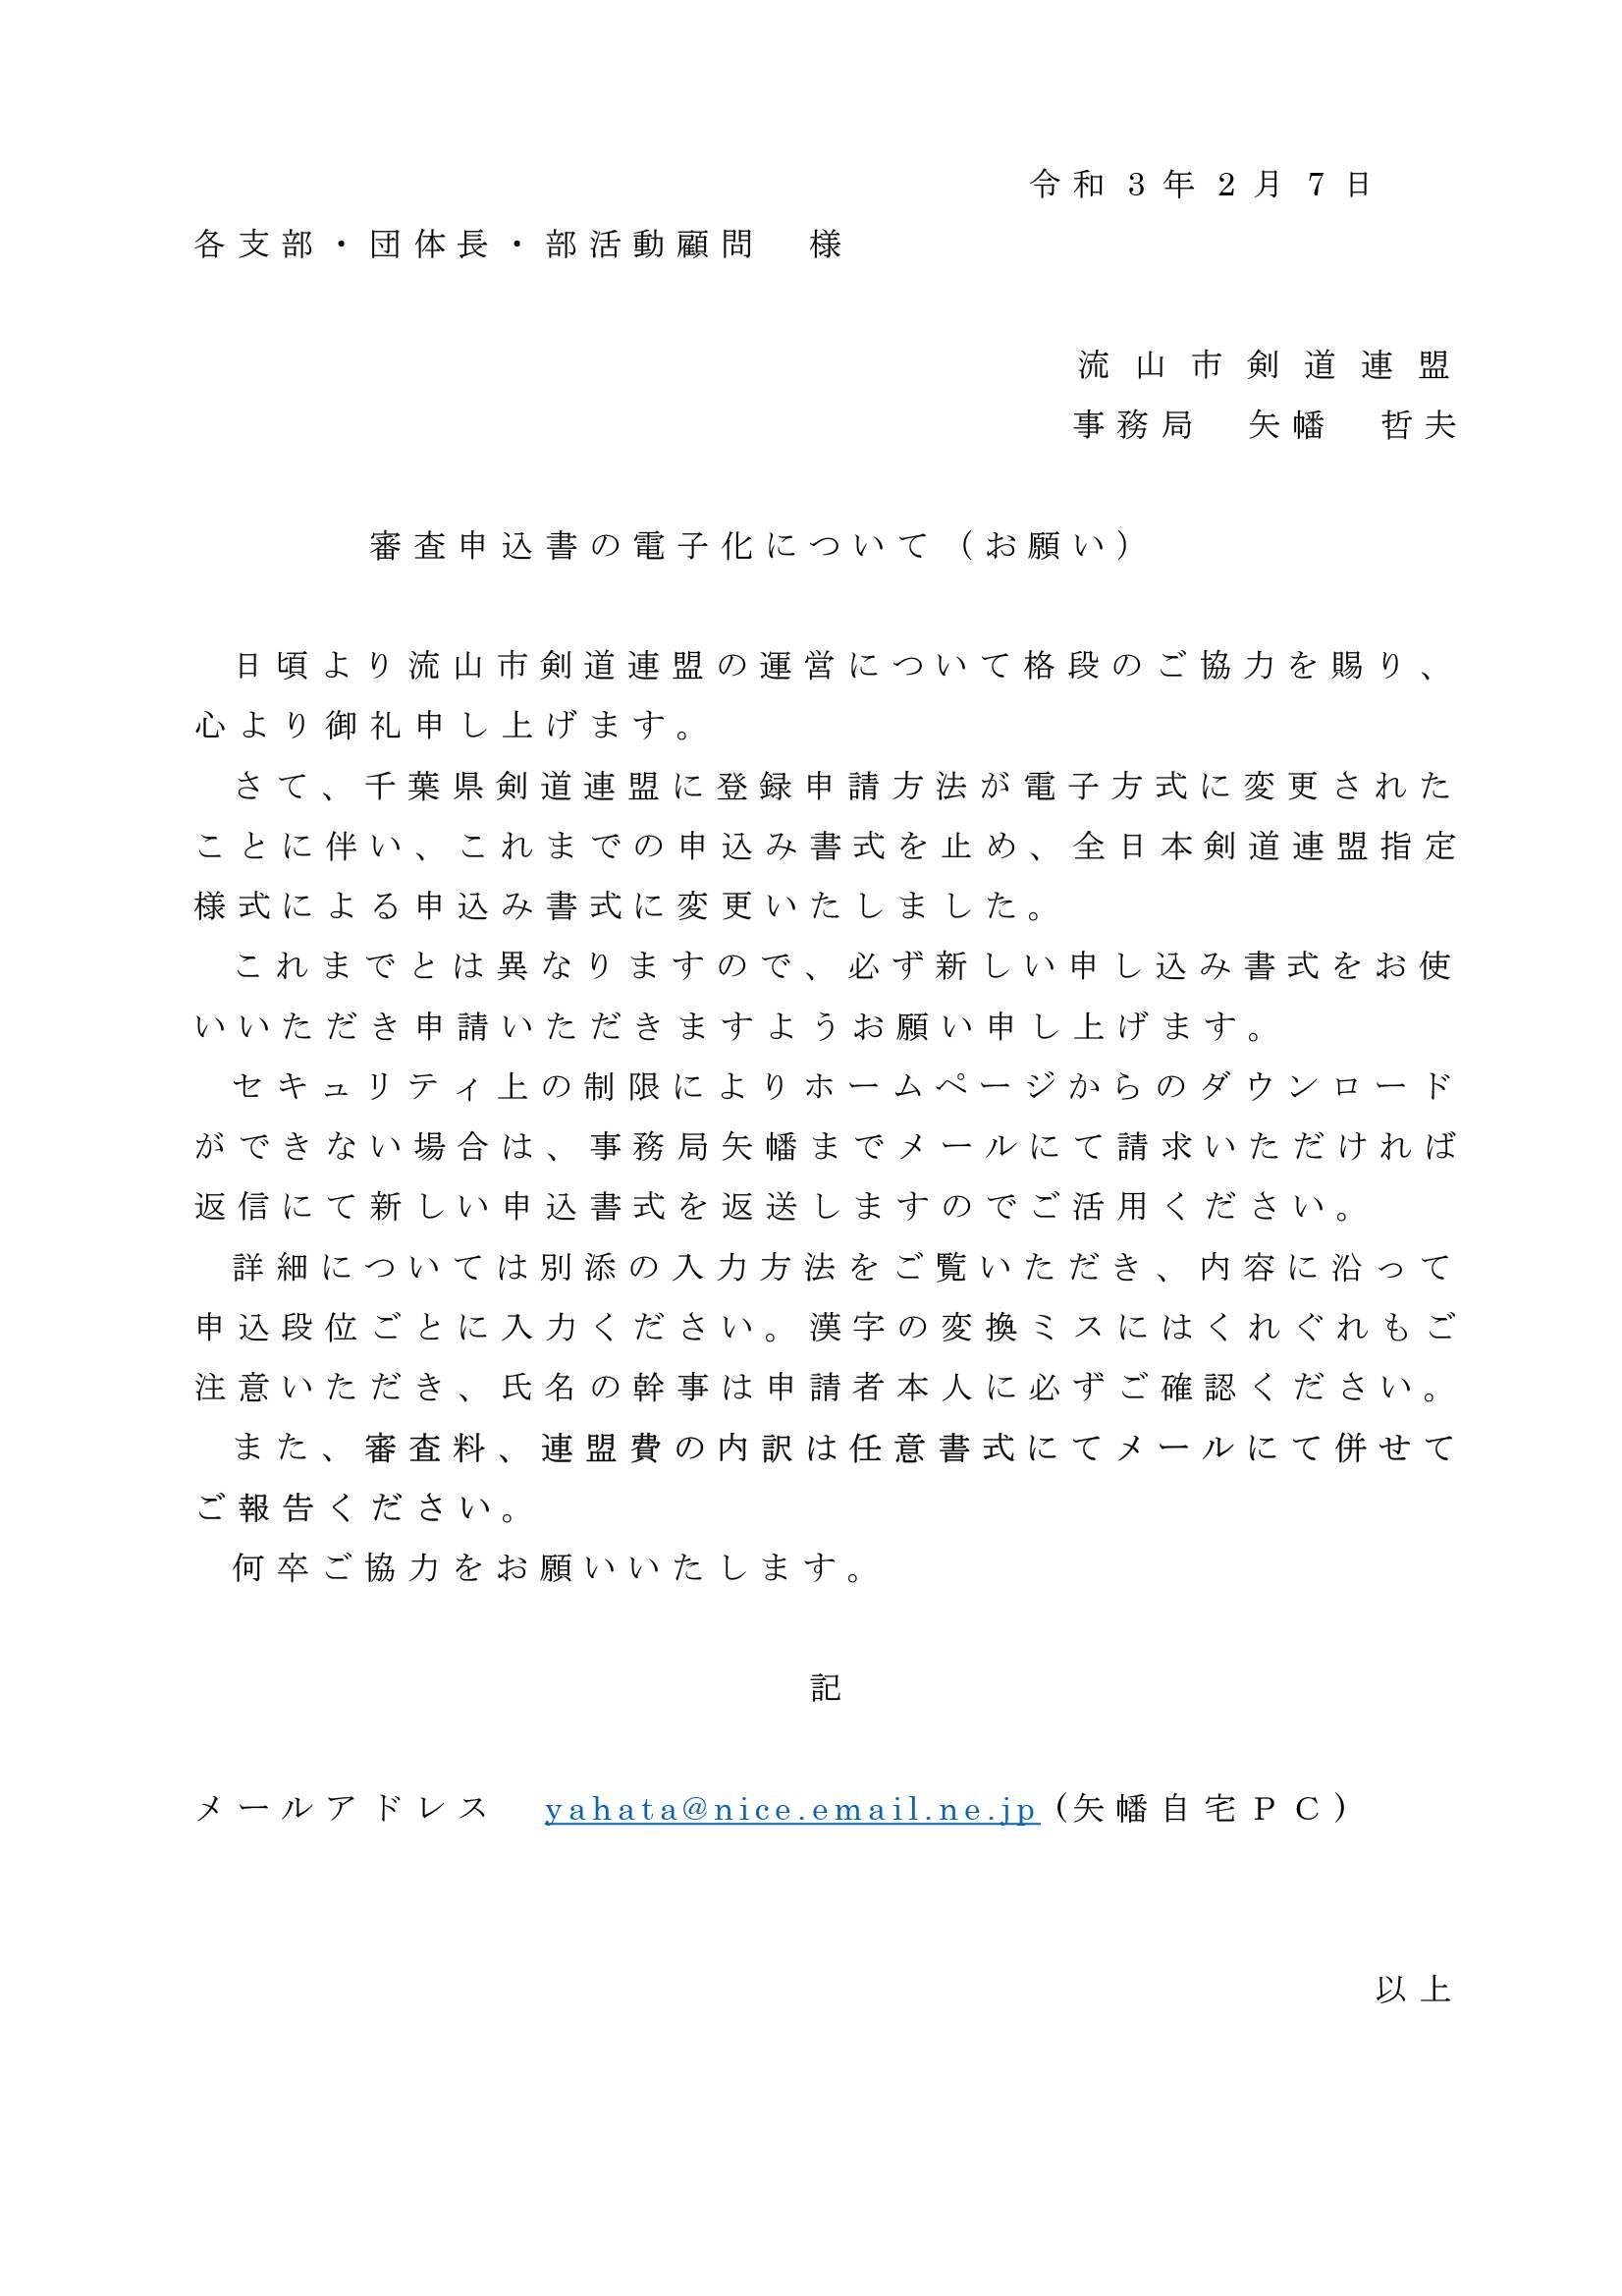 ⑥R3.7.25 三市合同審査会(野田市開催)HP用_0006